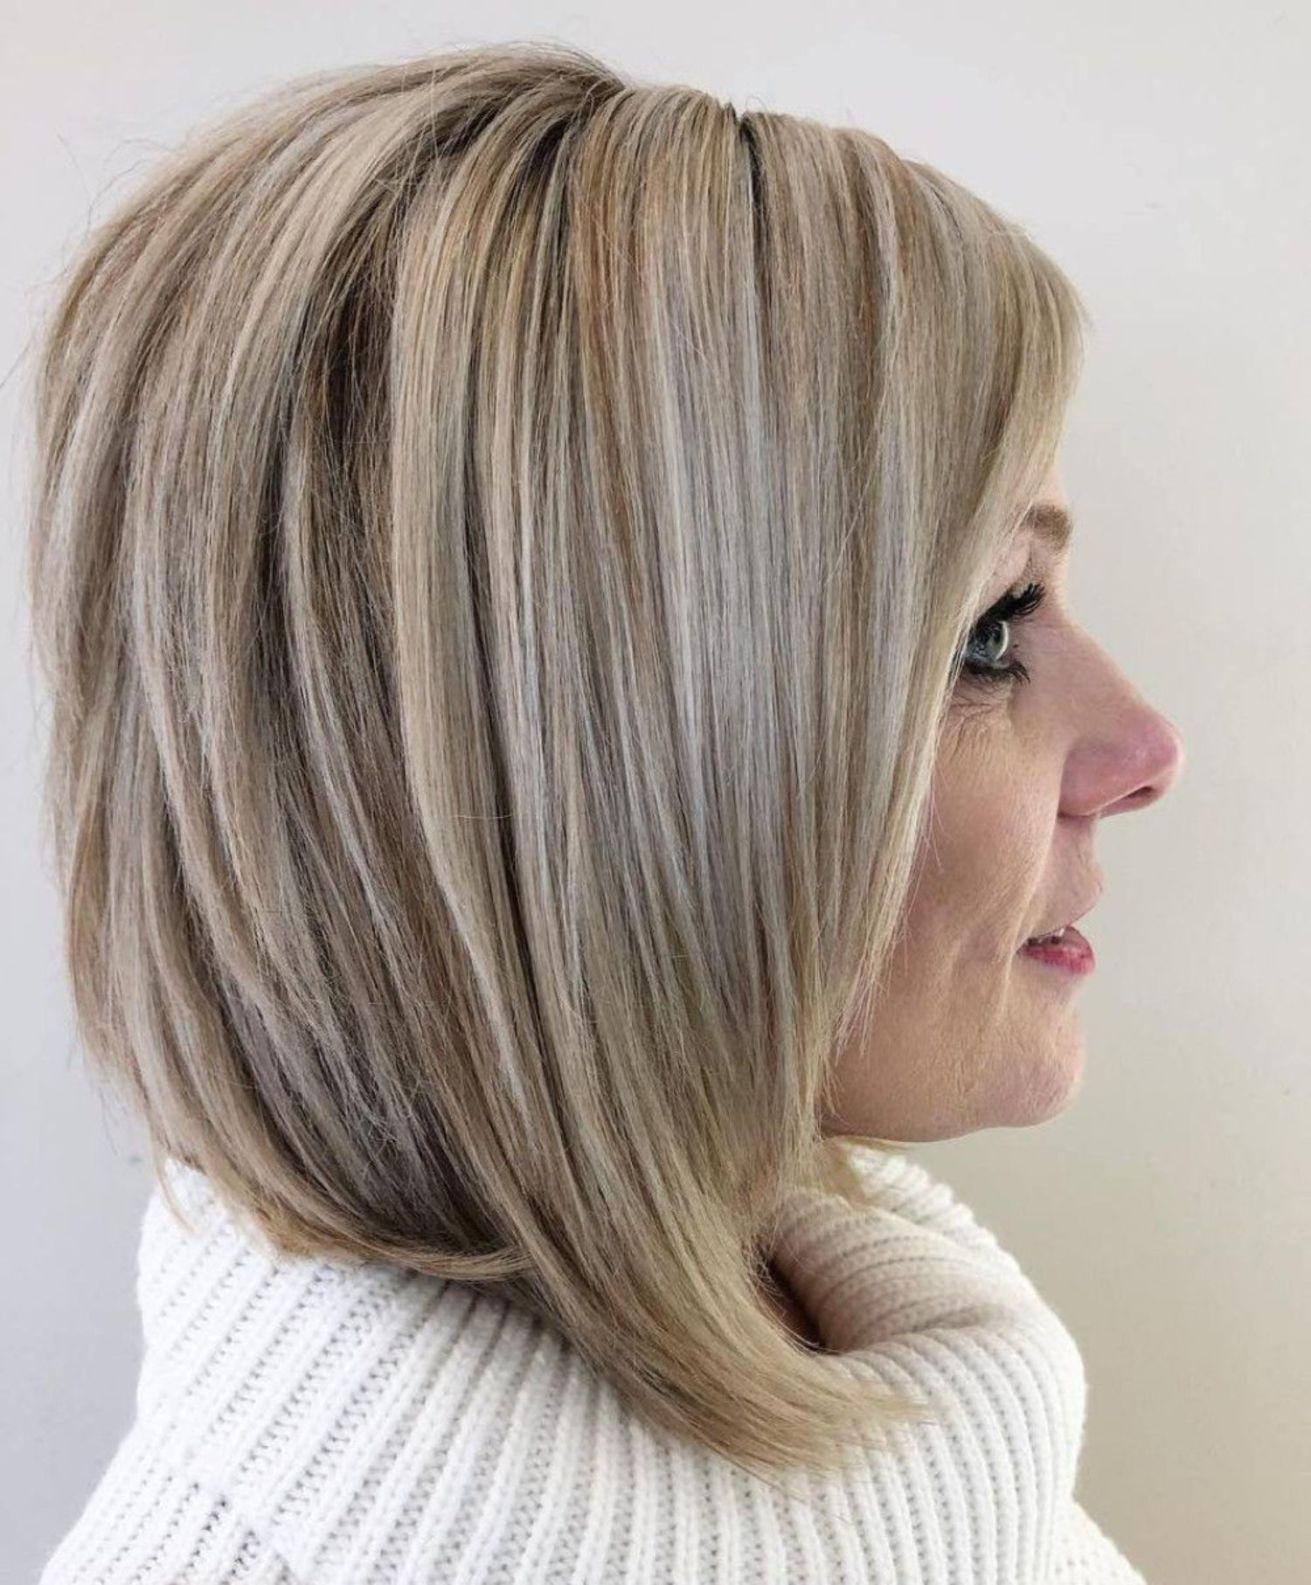 Over Angled Balayage Bob  Hair styles, Modern hairstyles, Medium